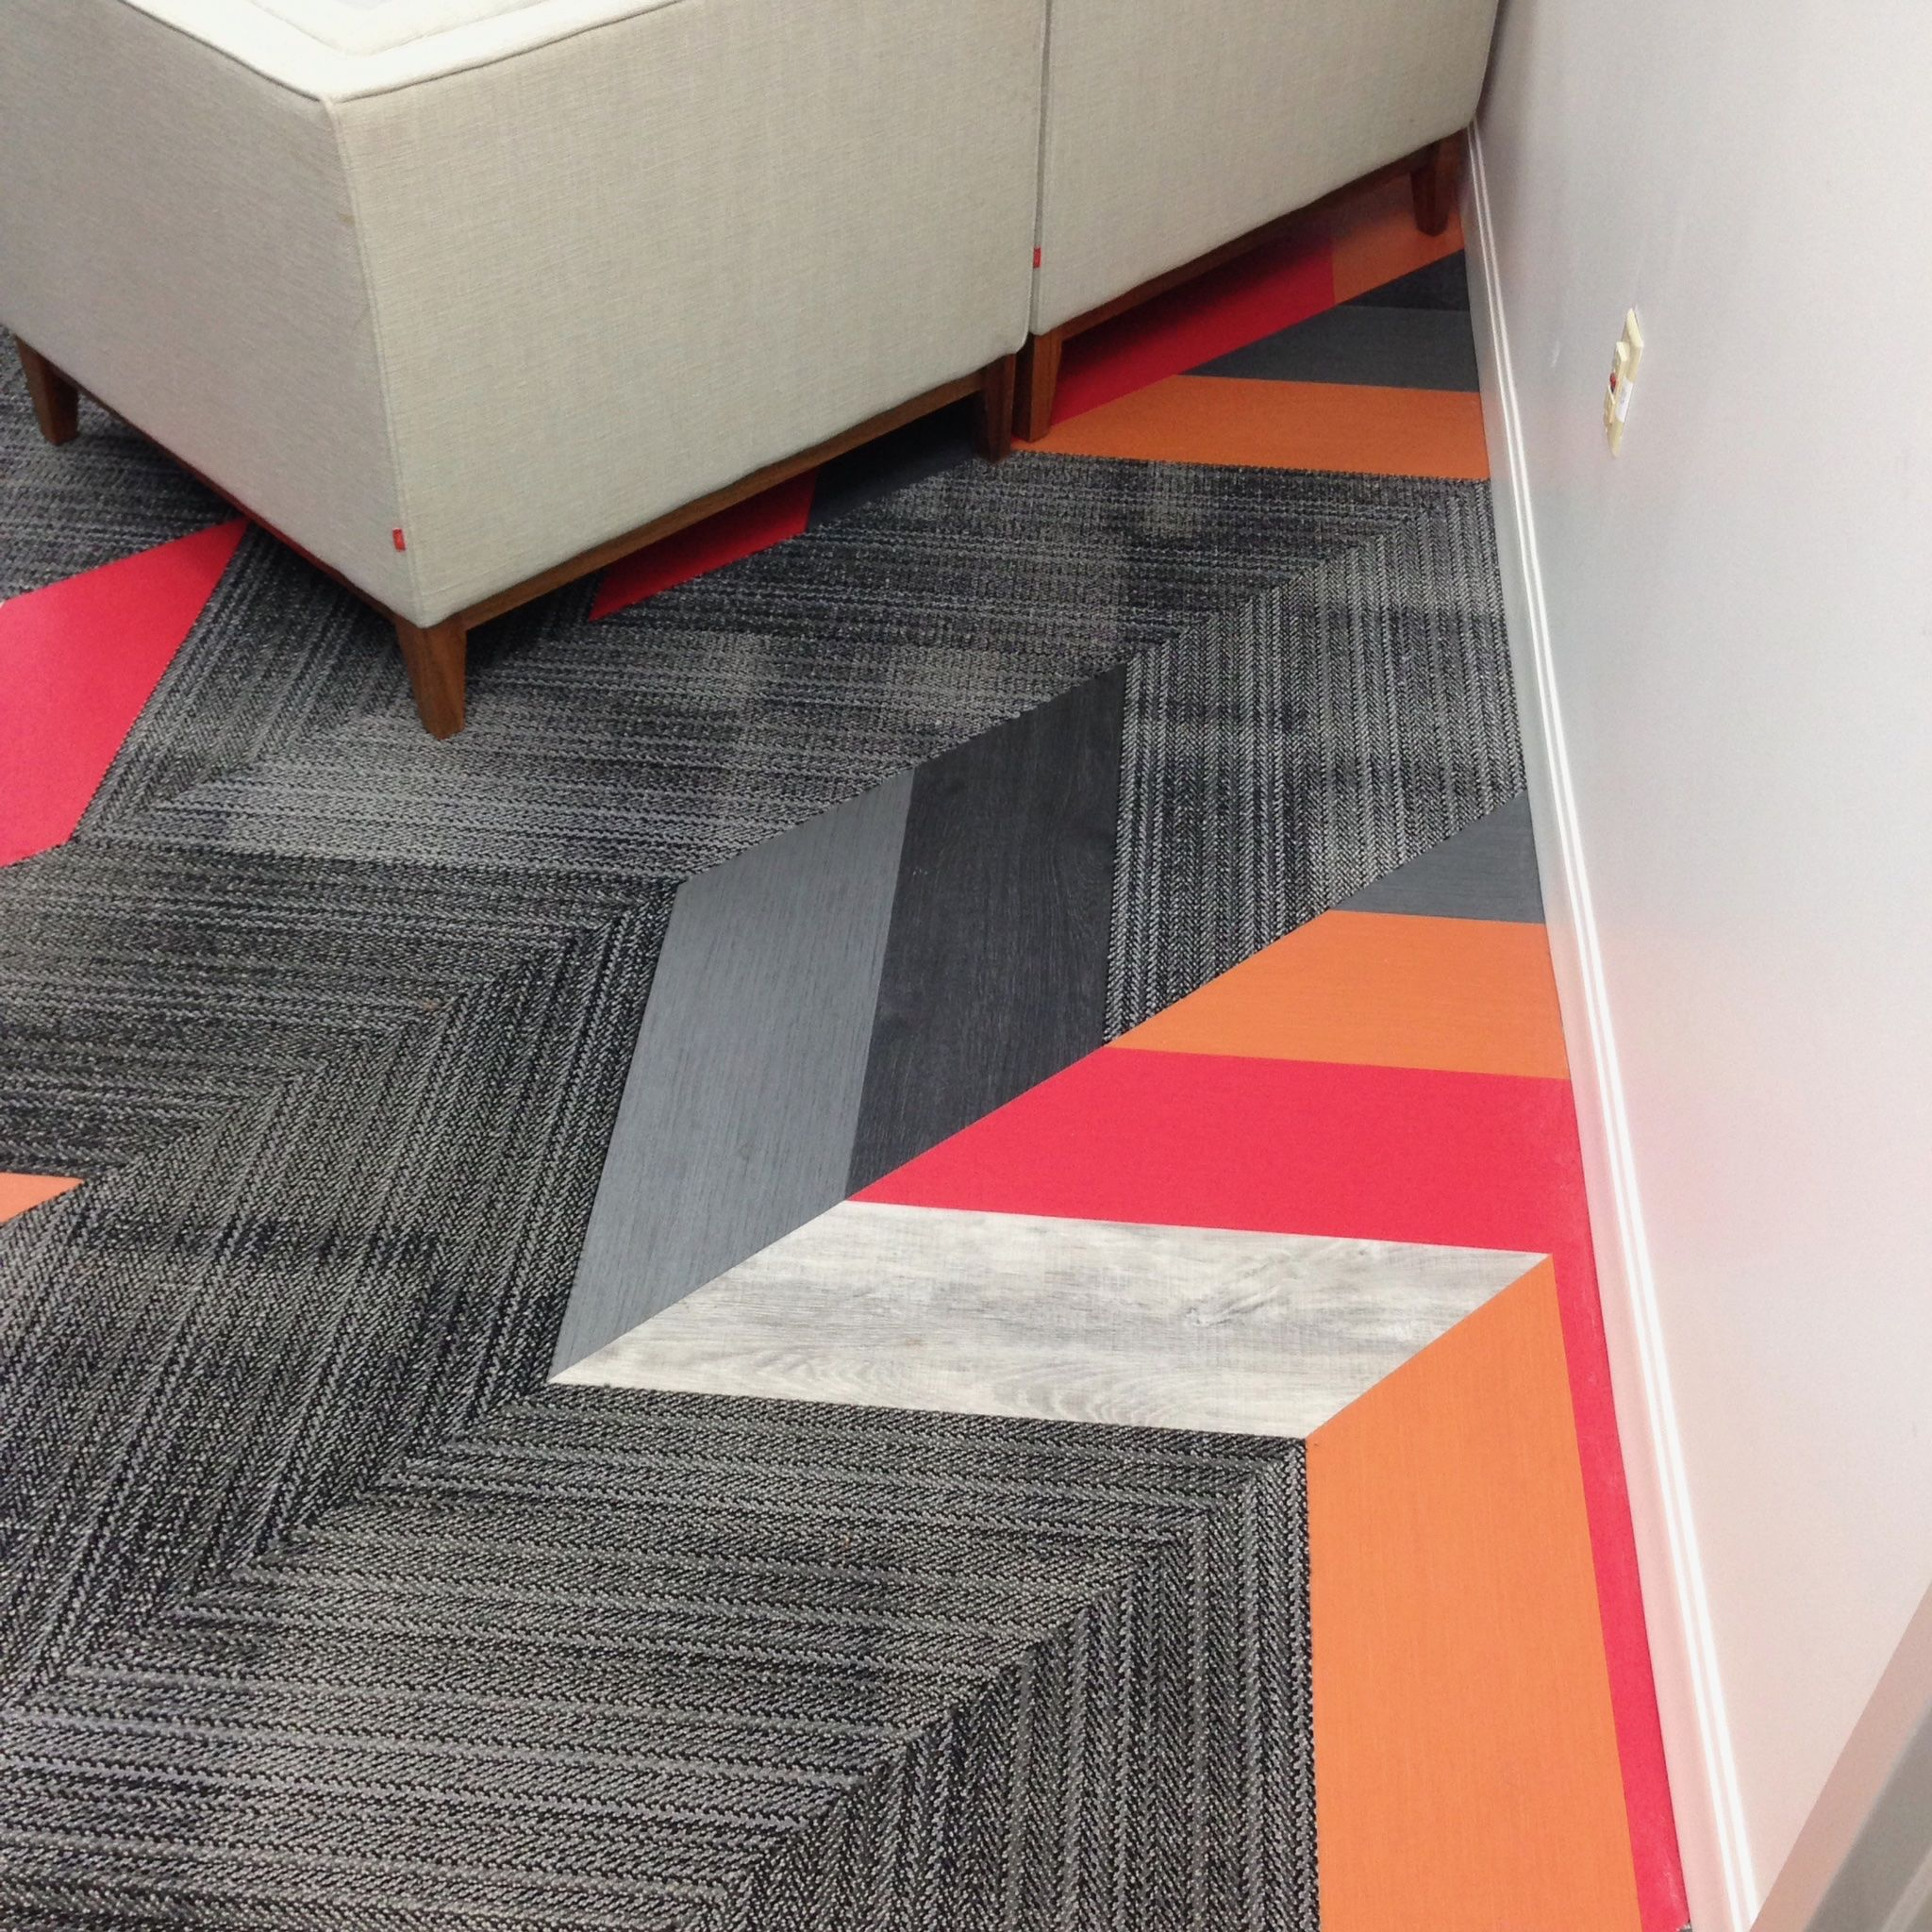 Mixed Materials Patcraft Flooring Carpet Tile Metallix